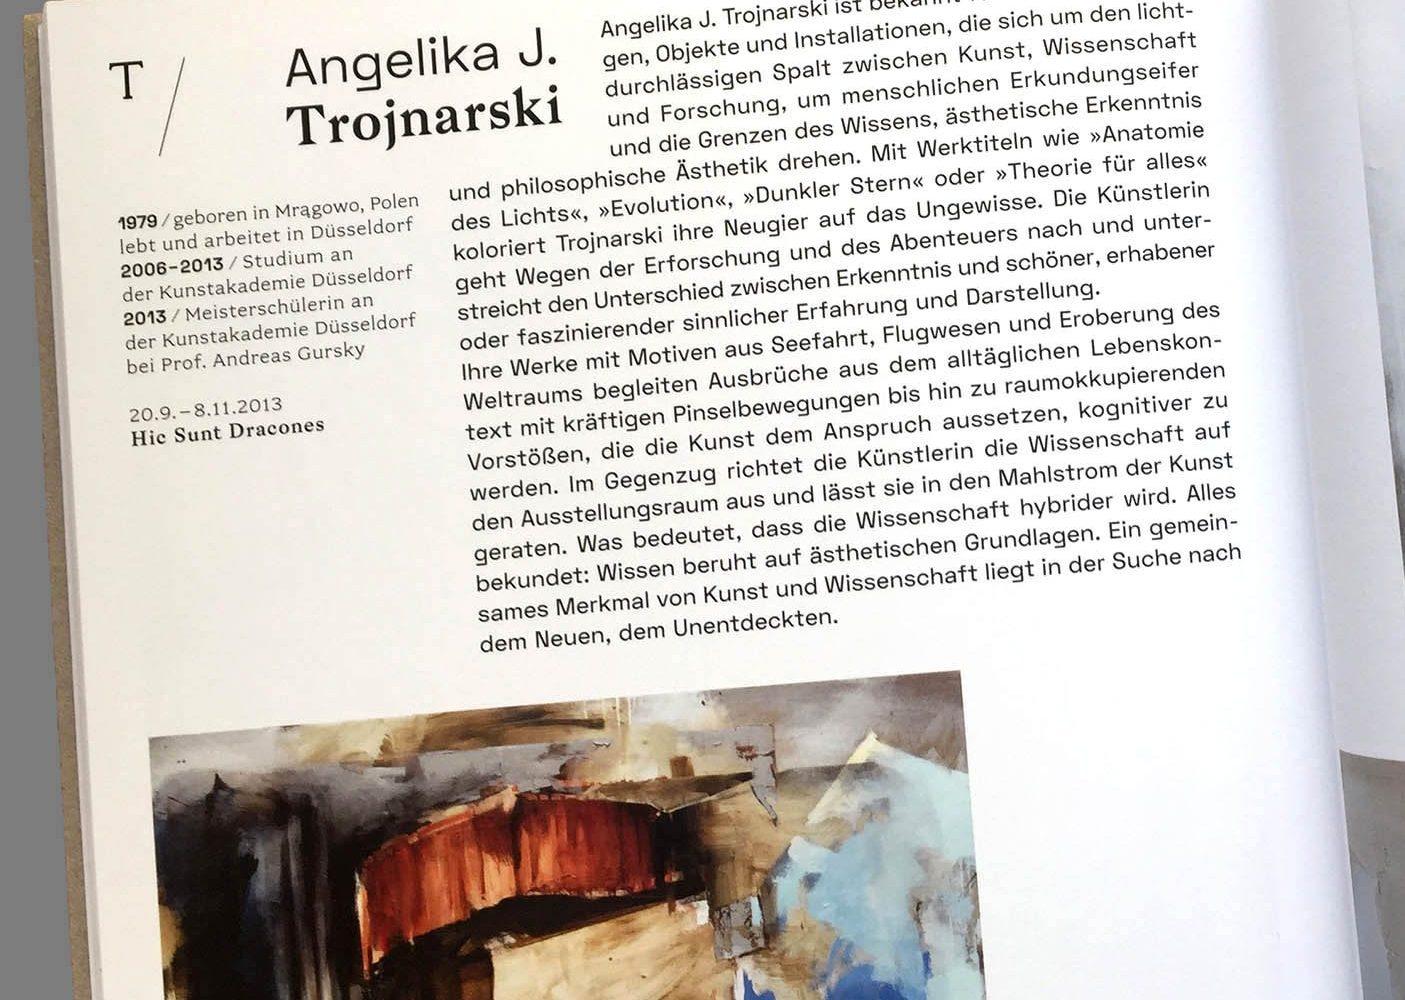 10Jahre1-Gladbeck-Angelika-J-Trojnarski